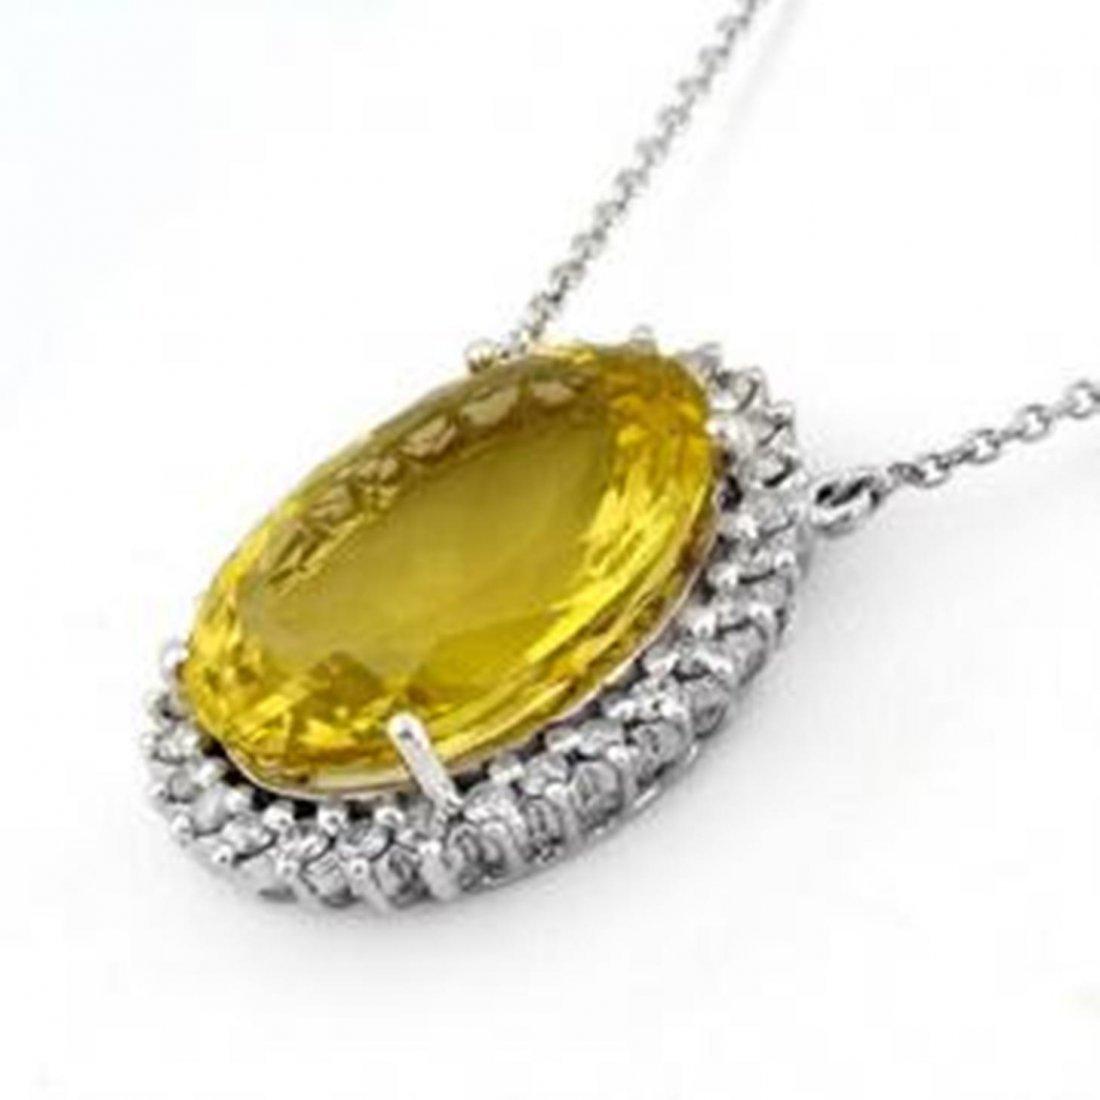 32.0 ctw Lemon Topaz & Diamond Necklace